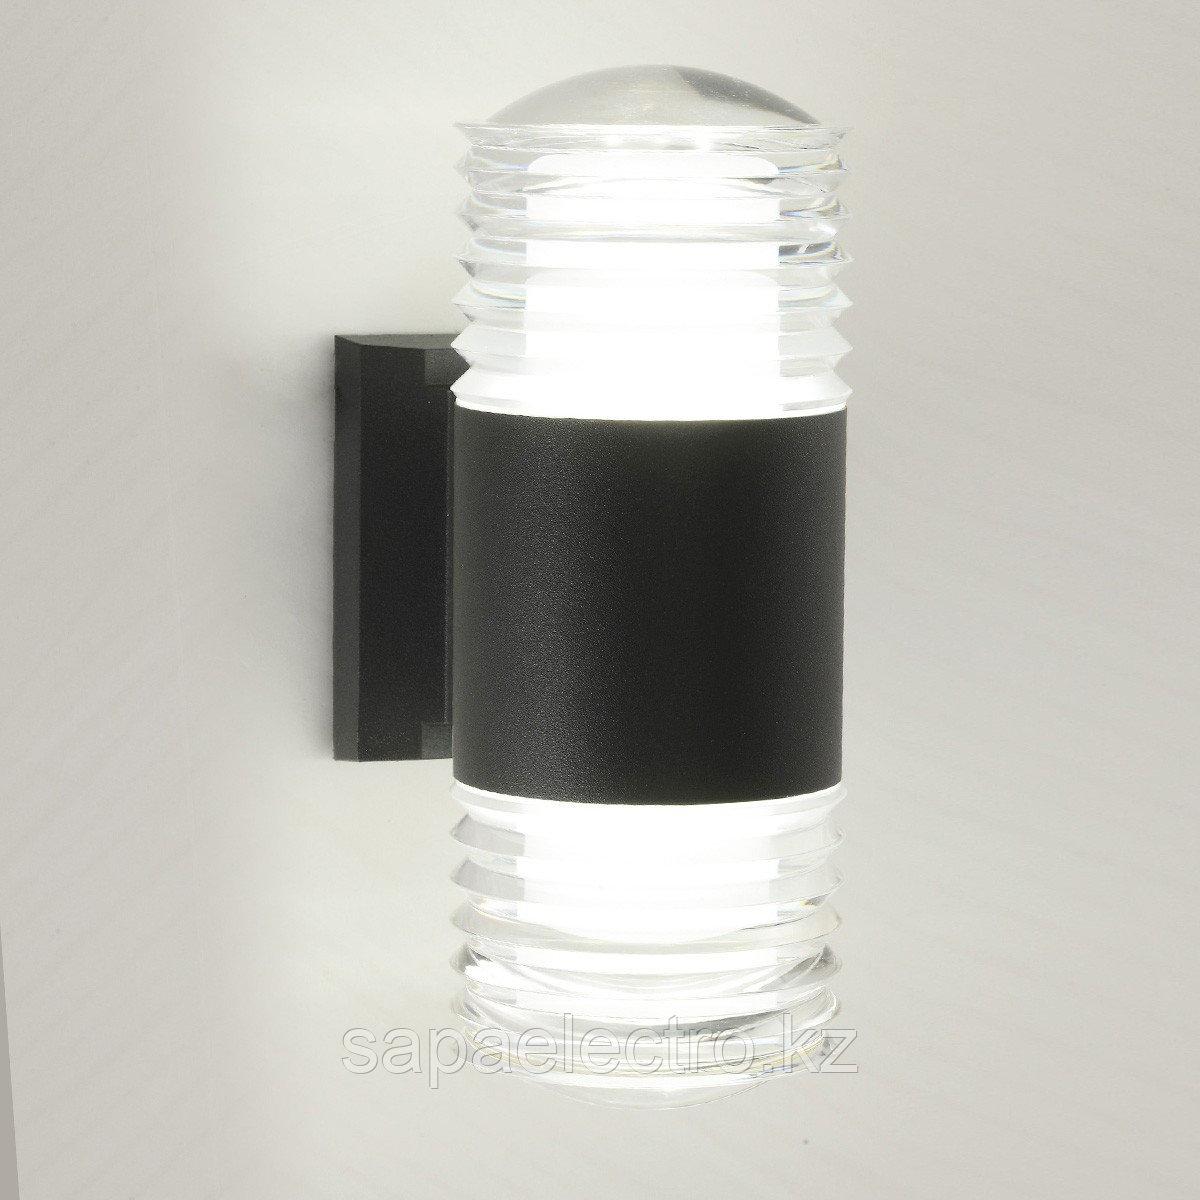 Свет-к LED B2172 2*5W Grey 5000K  (TS) 10шт